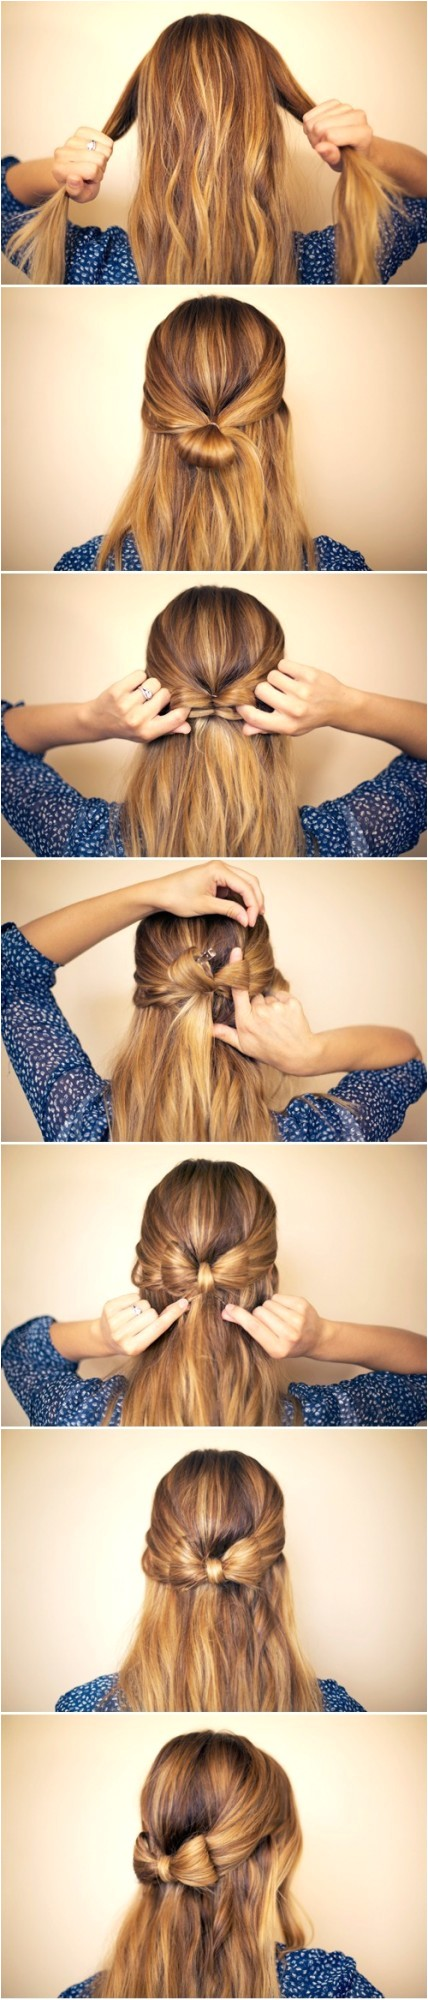 32 amazing hairstyles tutorials for hot summer days